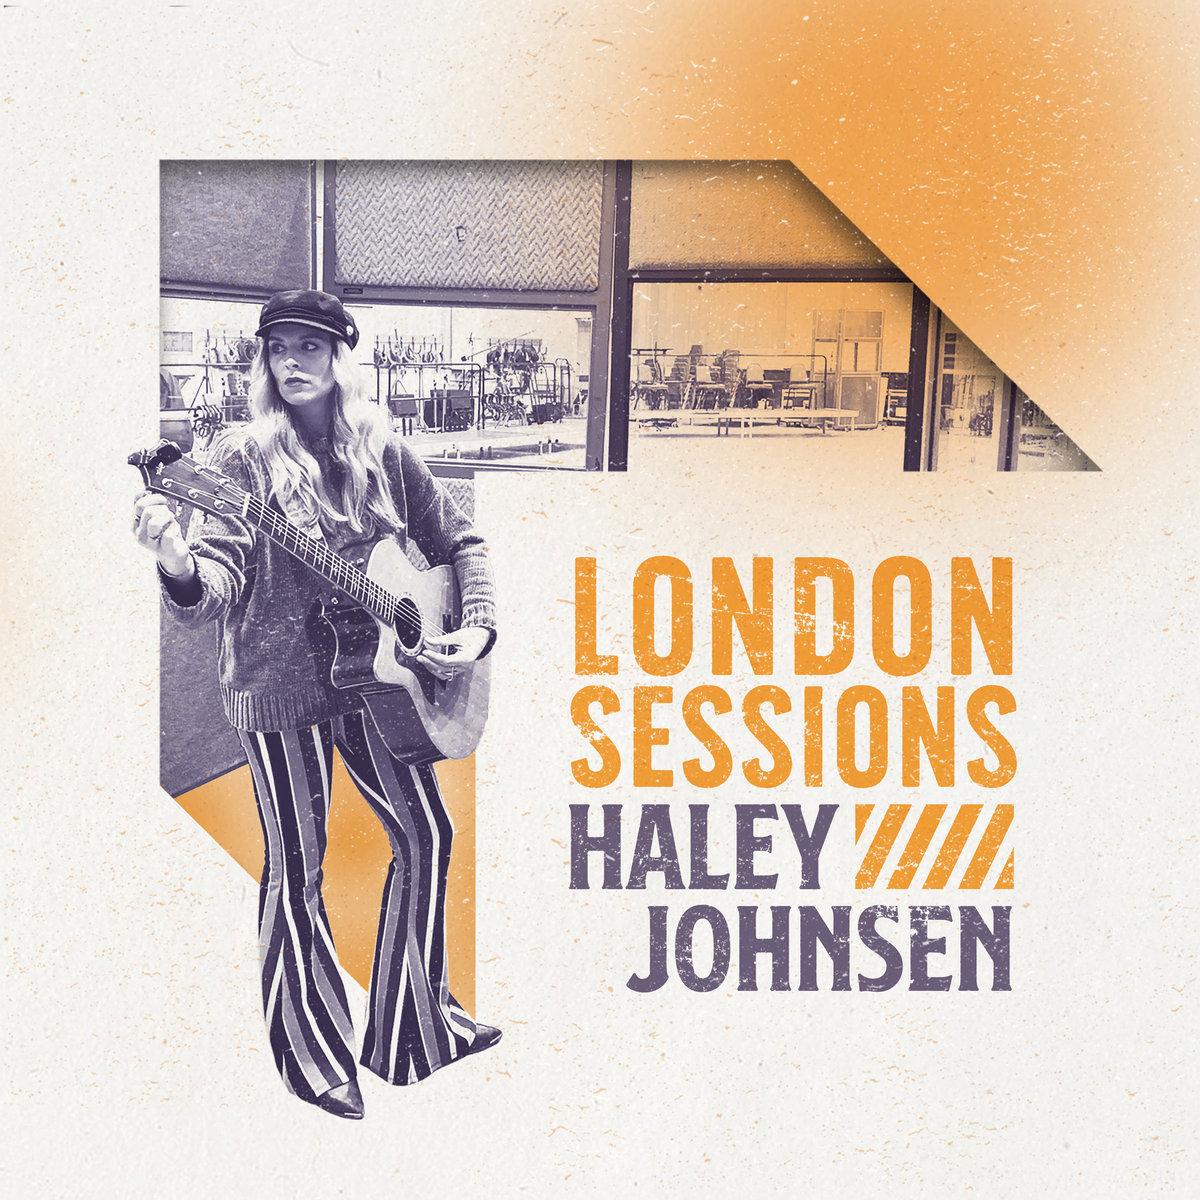 London Sessions - Haley Johnsen